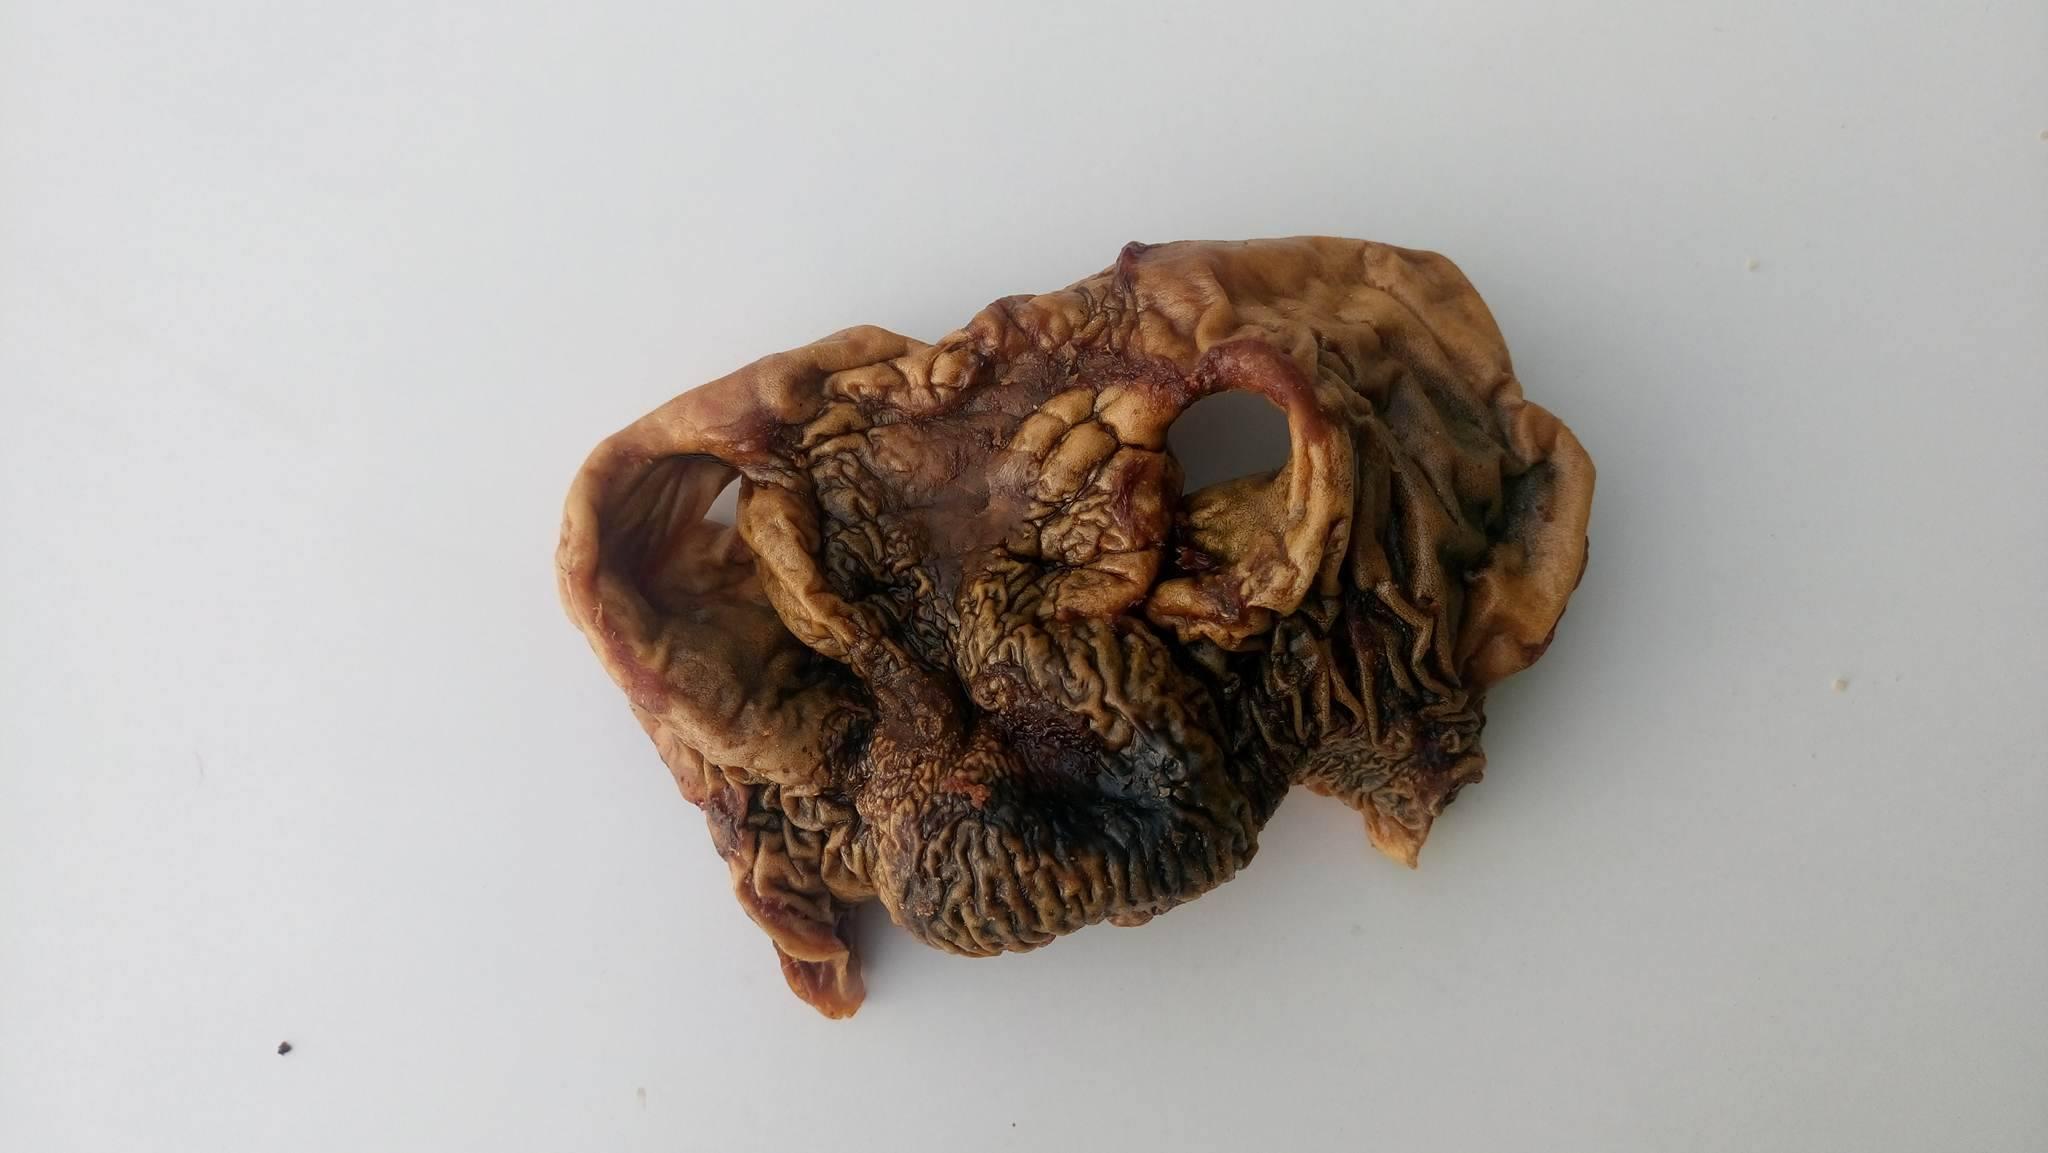 Kuivattu Hevosen nenu n.100g/kpl